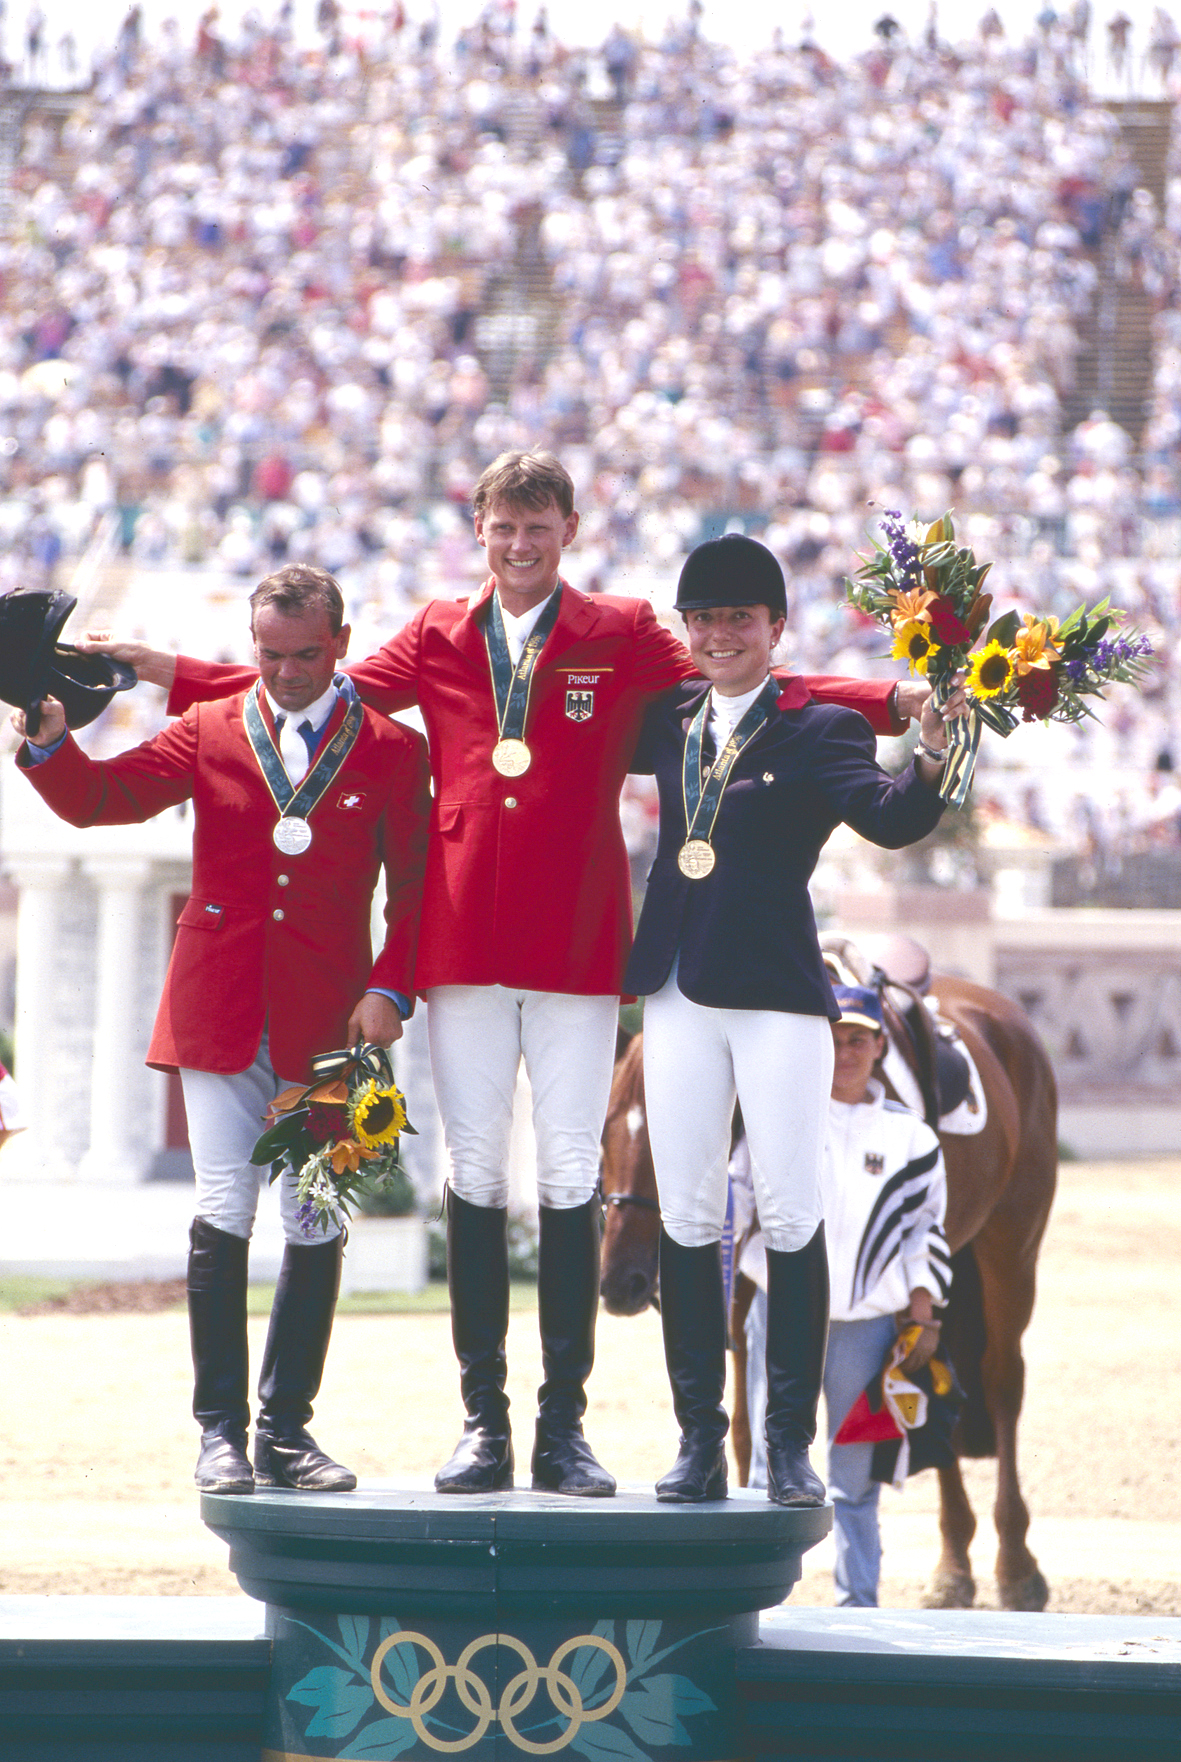 Jeux Olympiques d'Atlanta en 1996.